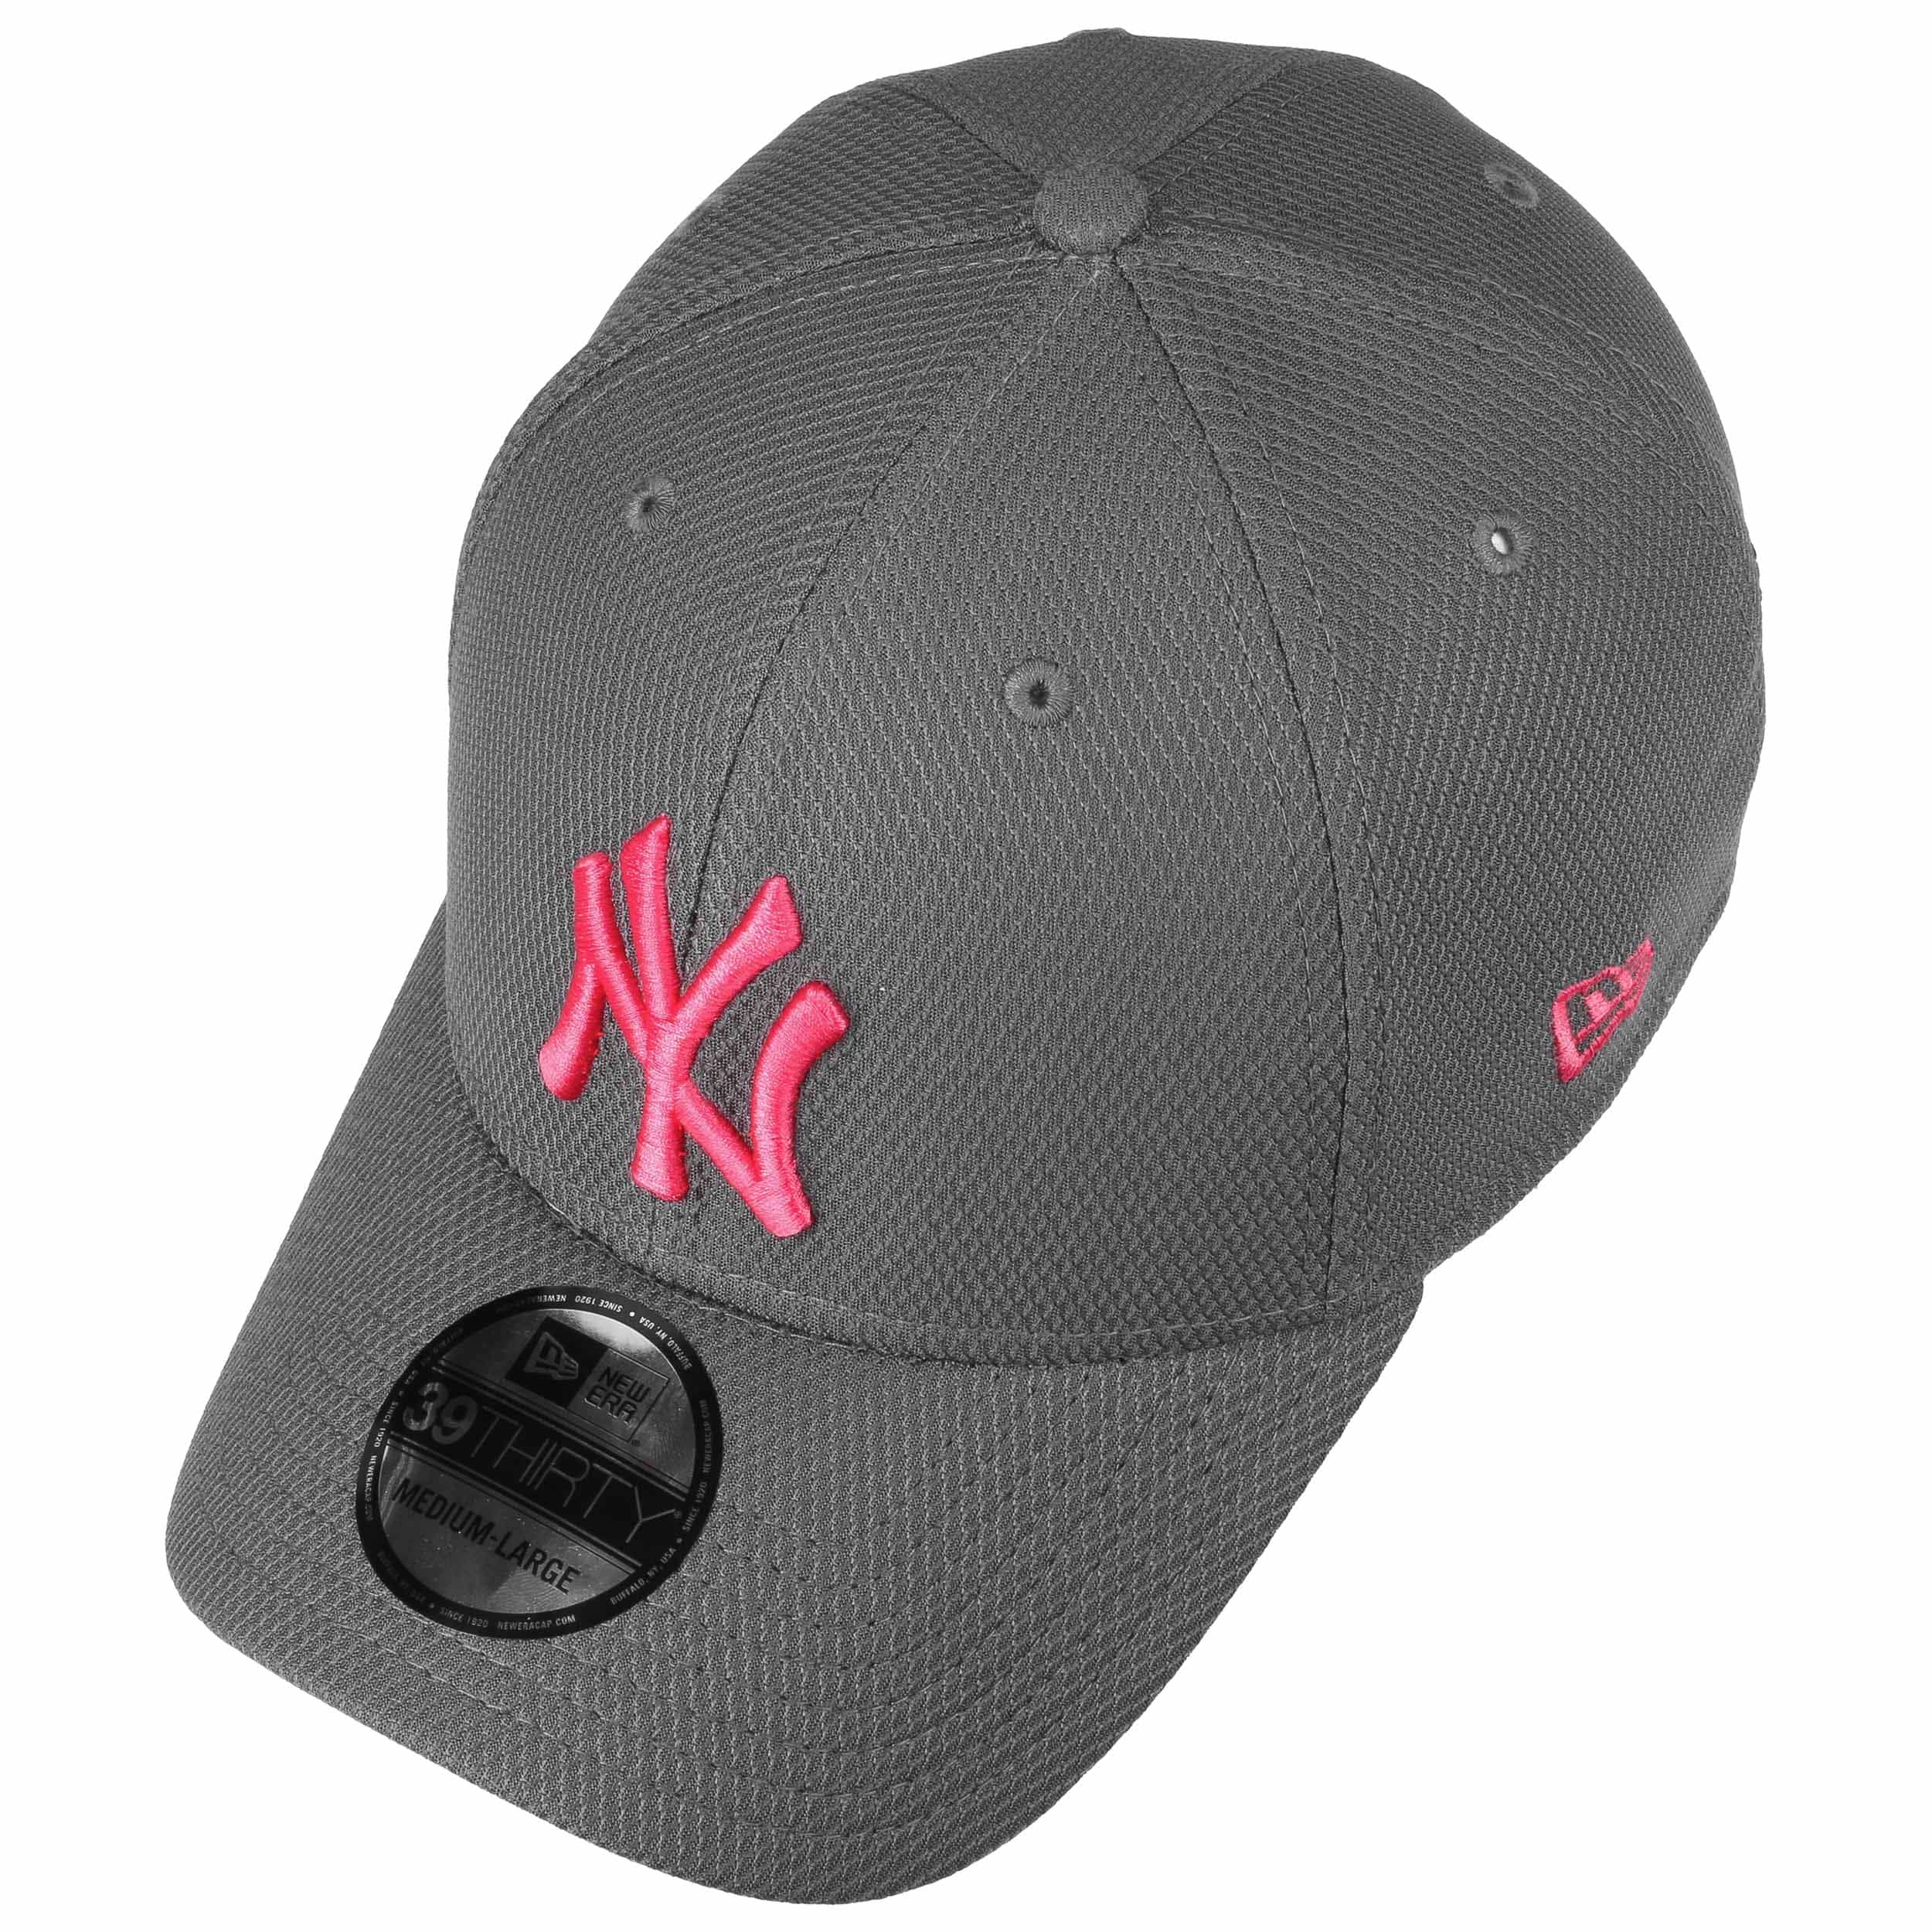 39Thirty Diamond Pop Yankees Cap by New Era - anthracite 1 ... 5e44abb6880